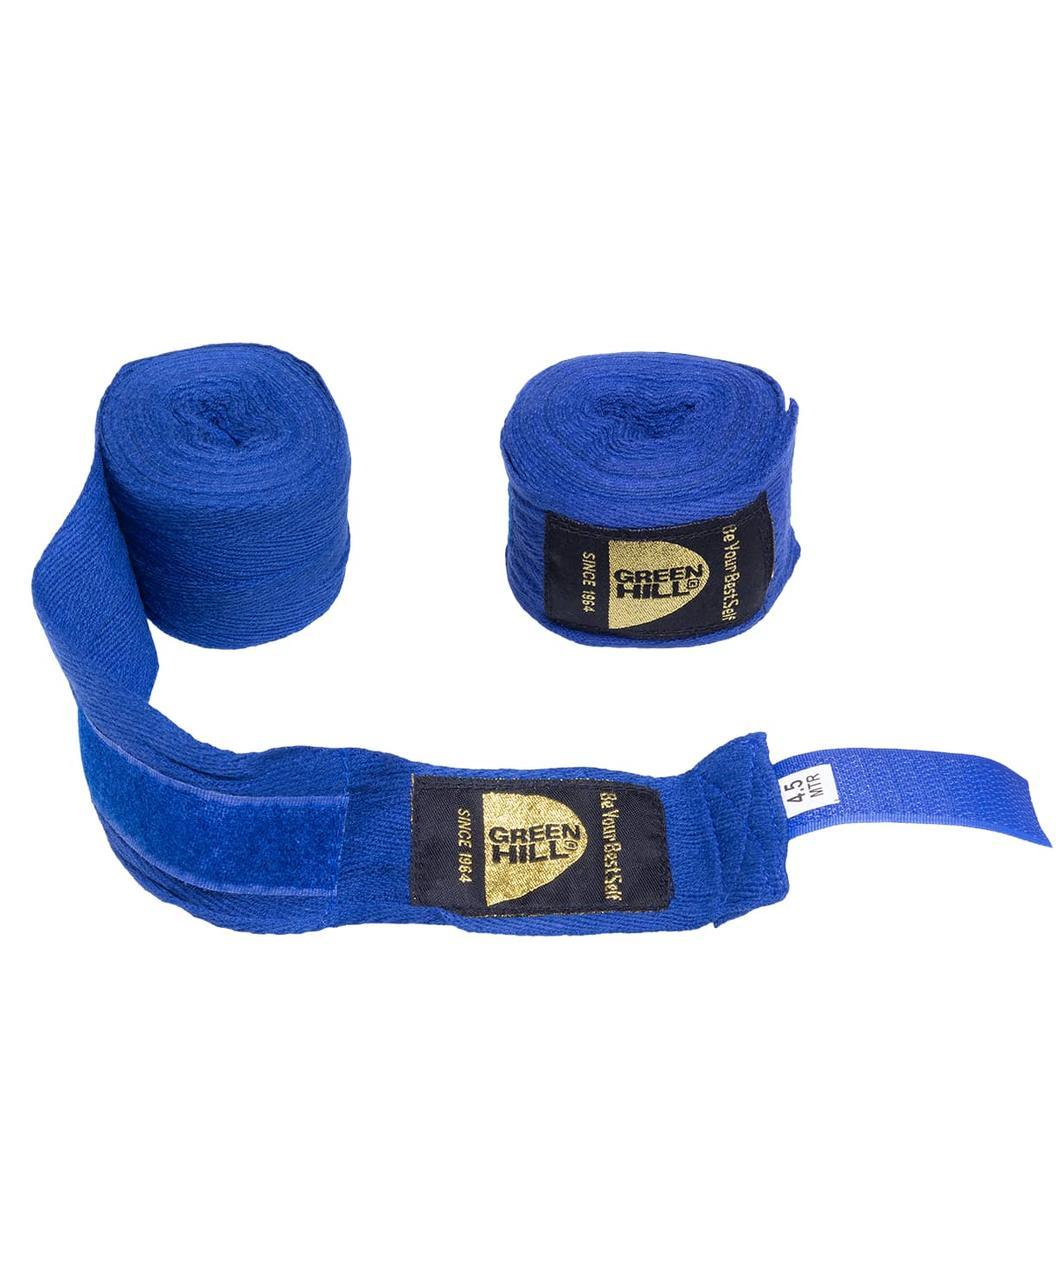 Бинт боксерский BP-6232d, 4,5м, эластик, синий Green Hill